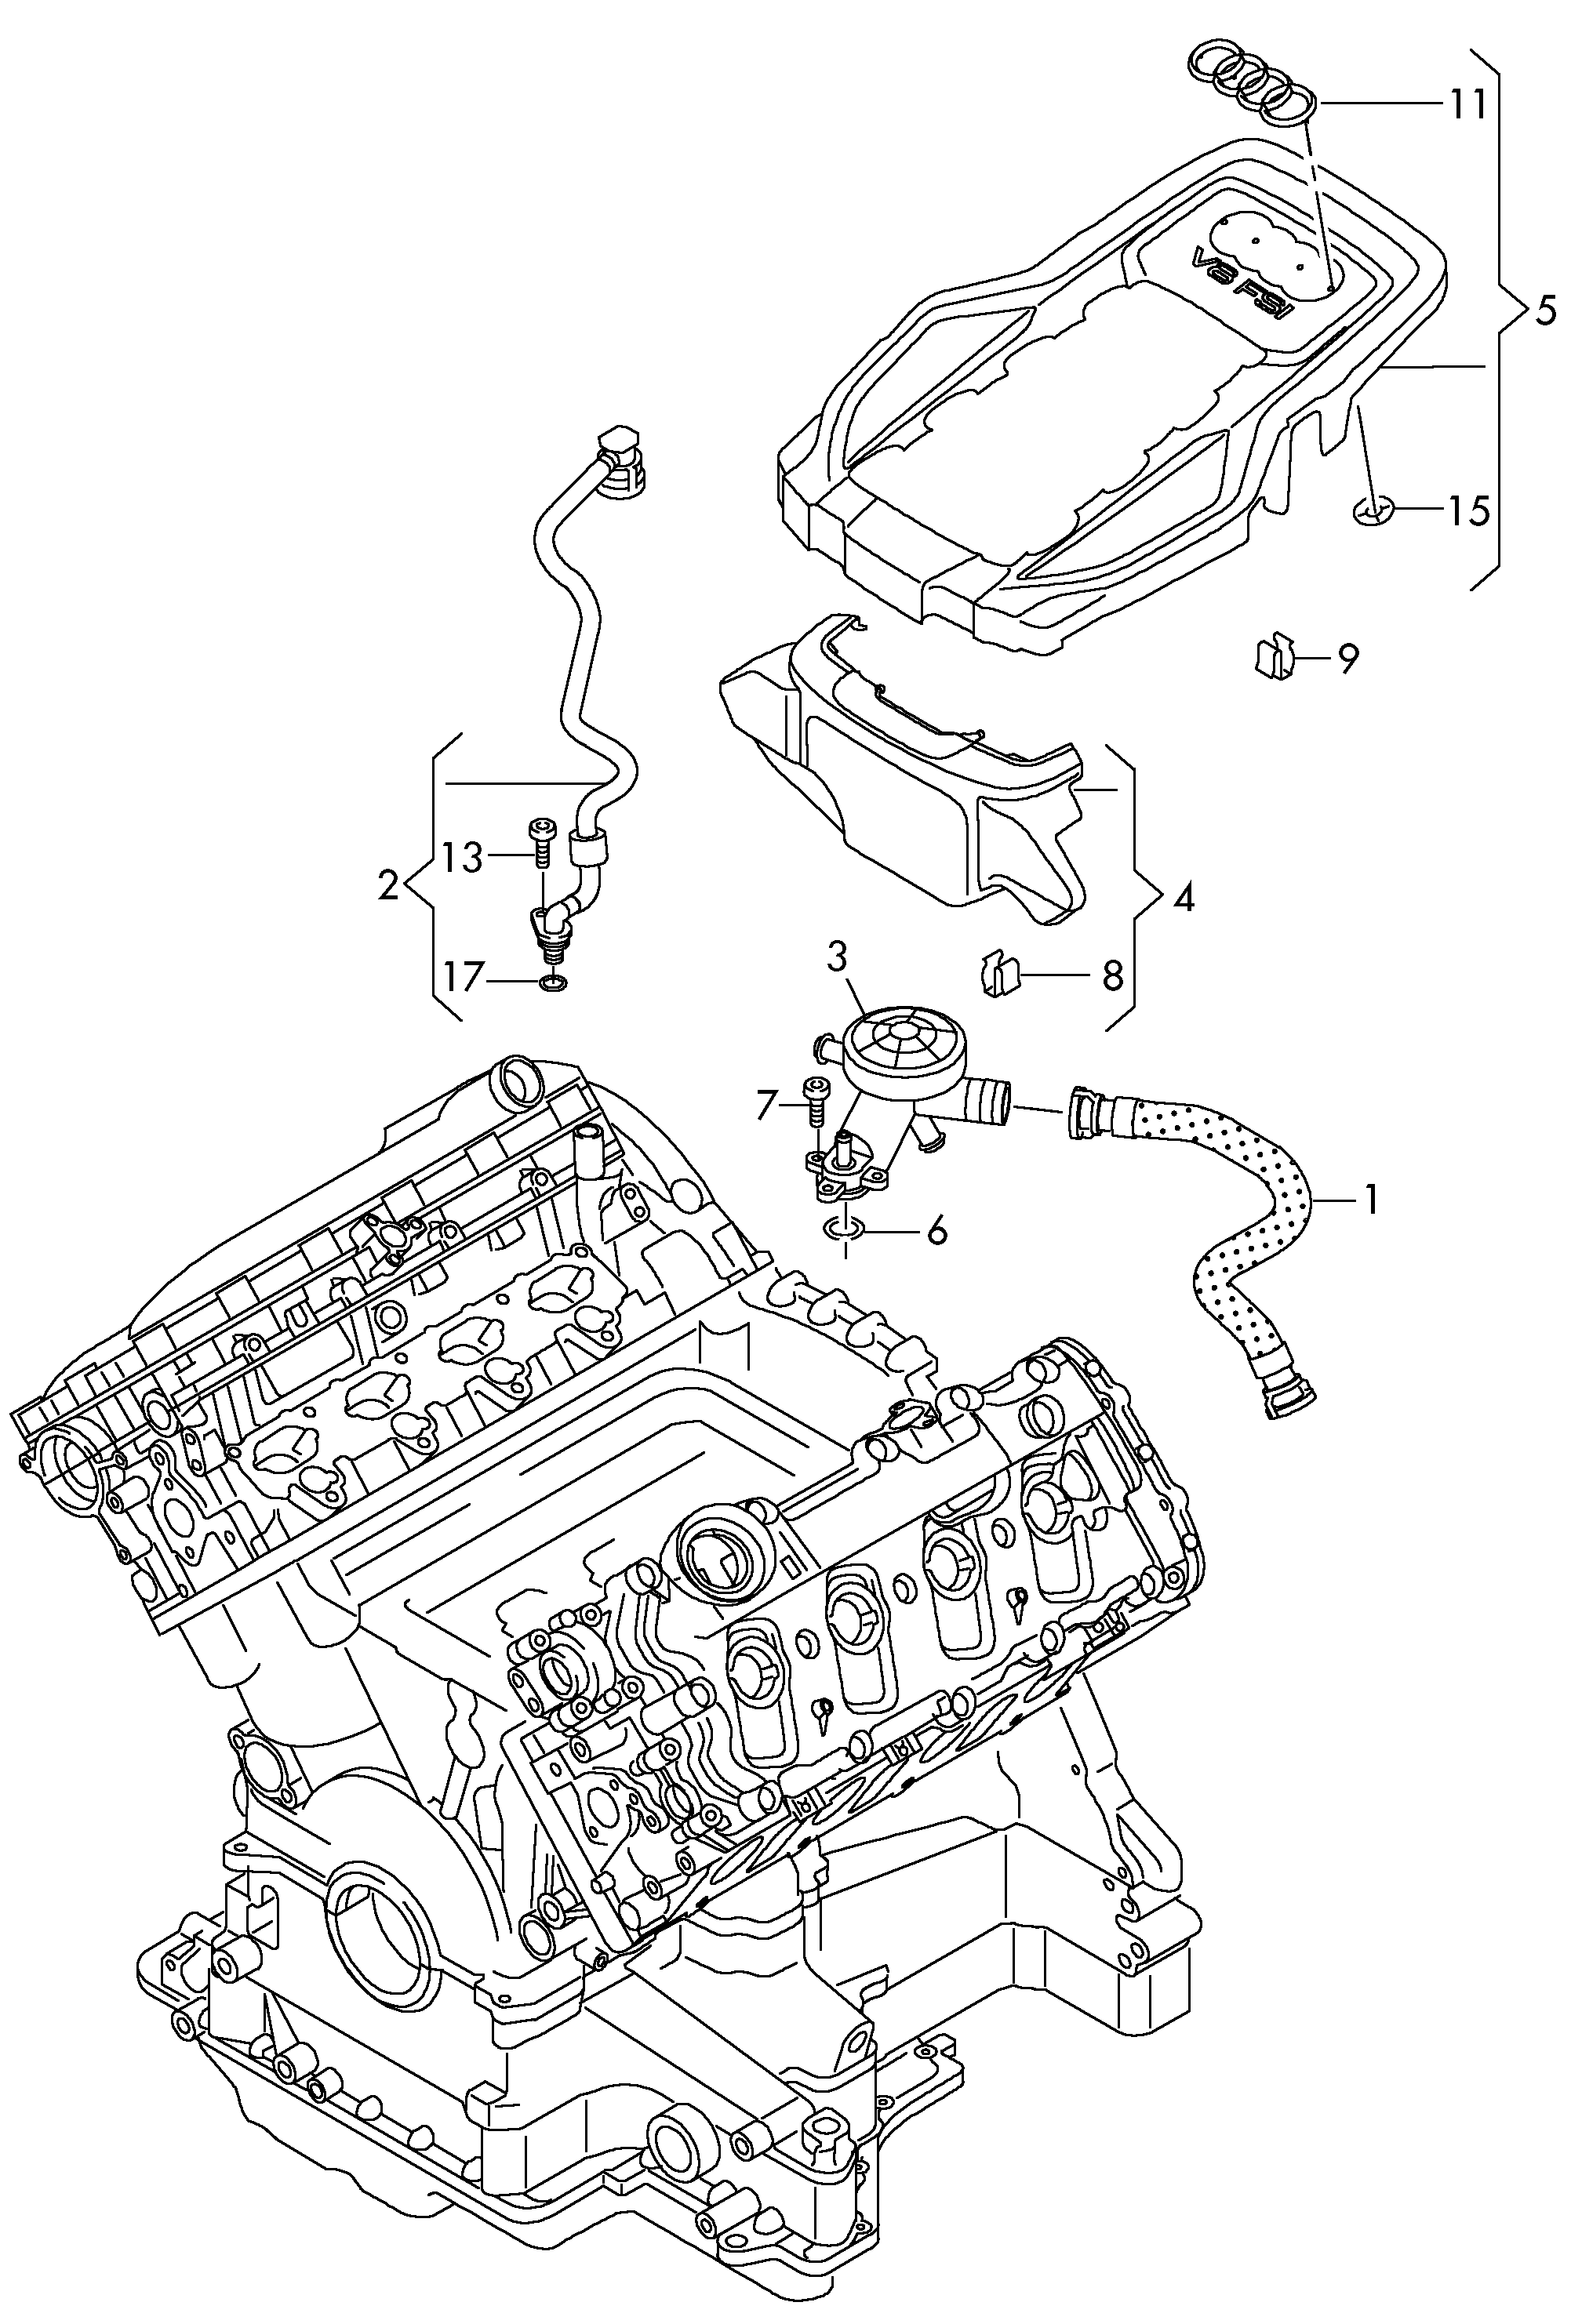 Audi A8 (2010 - 2013) / VAG Etka